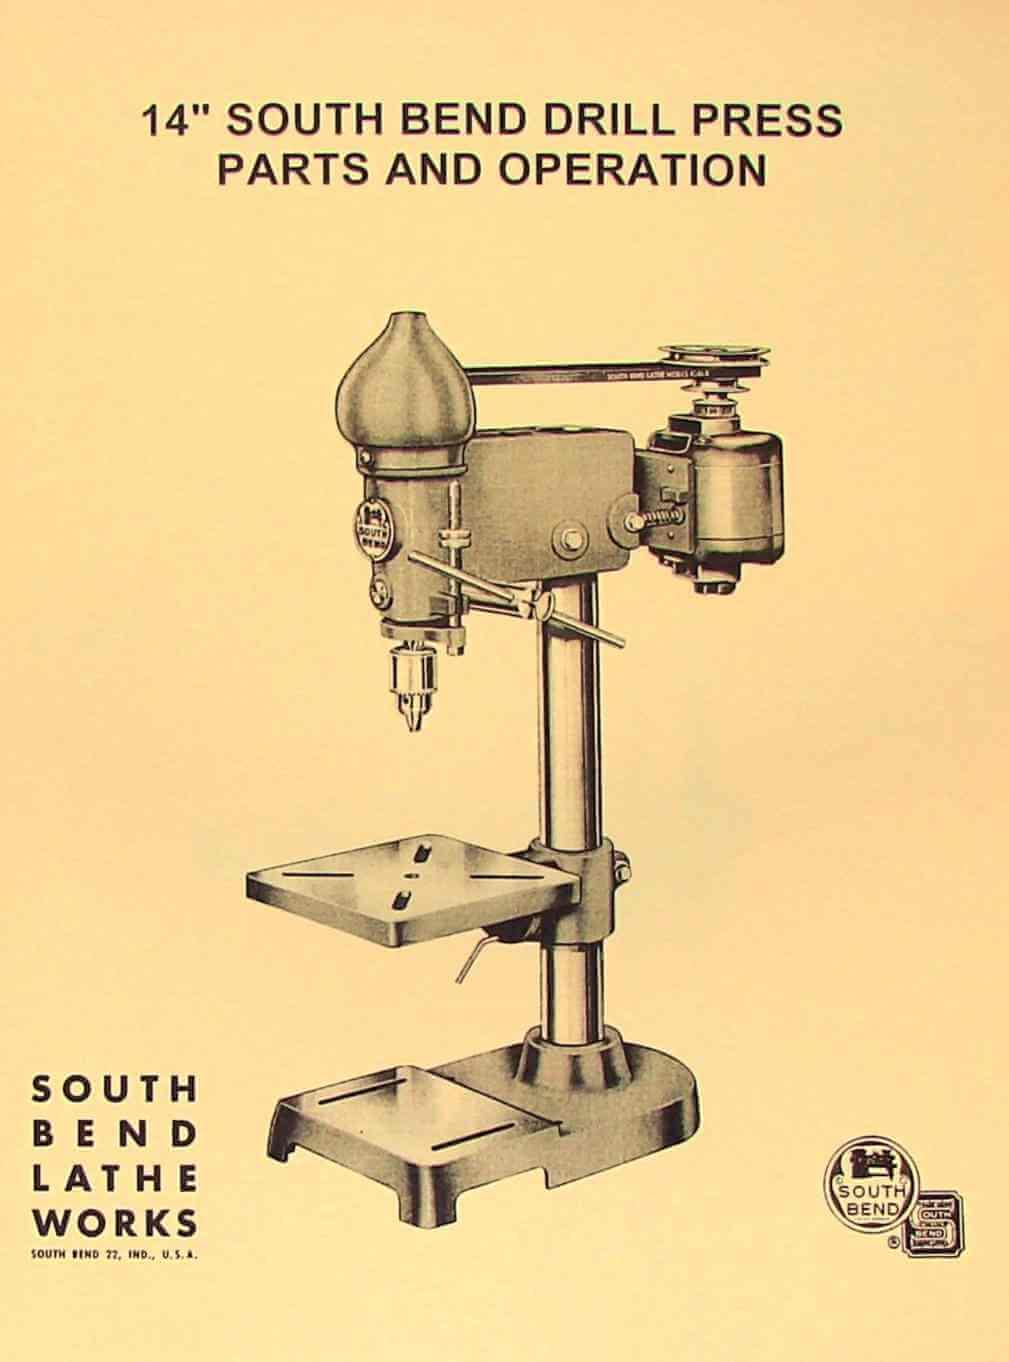 Wilton Drill Press 2015 Manual Vise Parts Diagram South Bend 14 Operator S Ozark Tool Rh Ozarktoolmanuals Com Delta Rockwell Variable Speed Floor